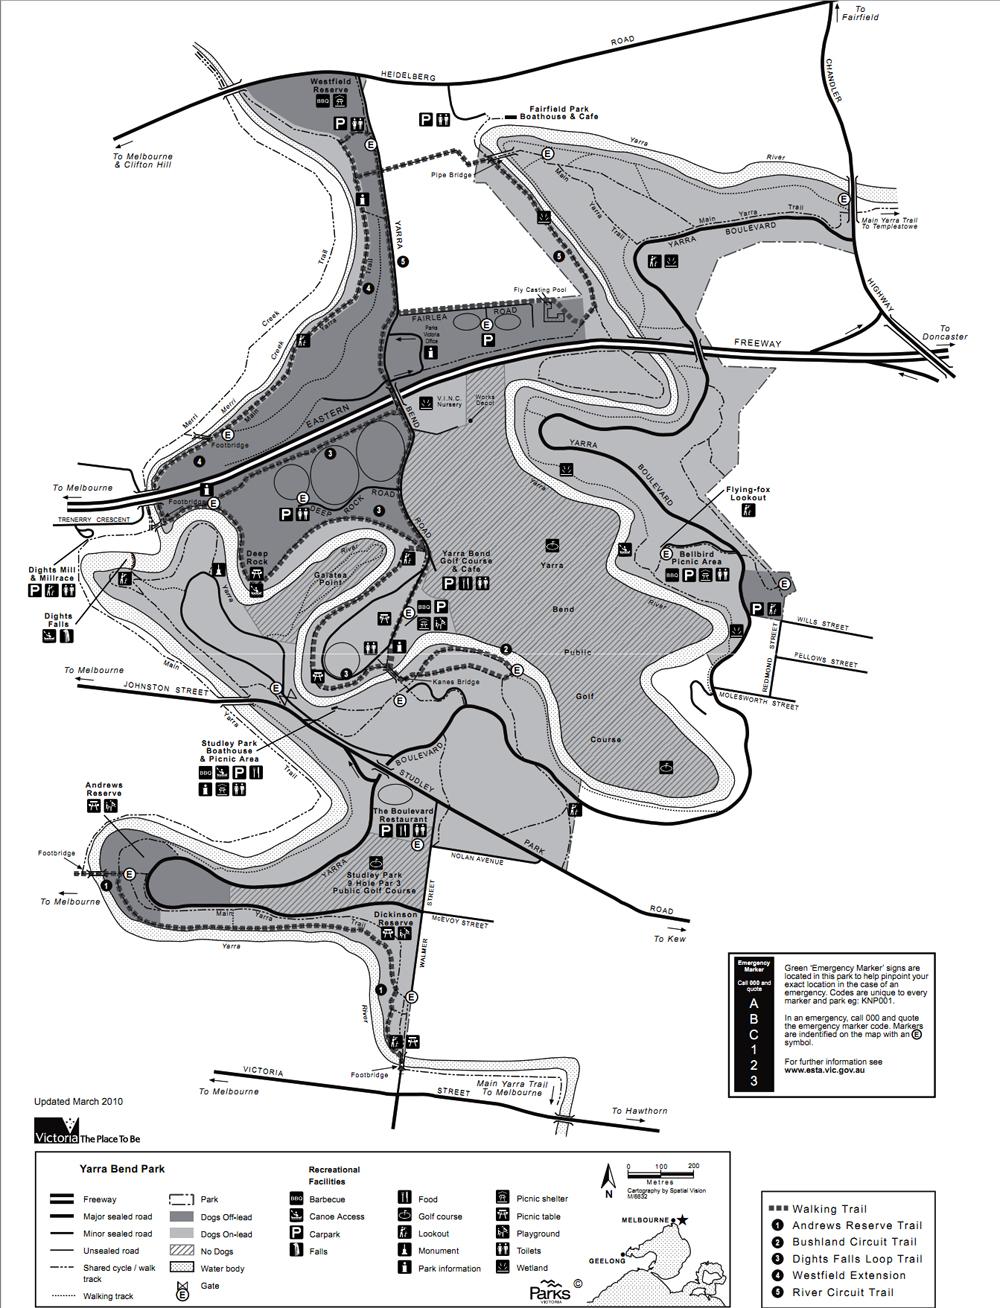 Australia Melbourne Yarra Bend Park Map